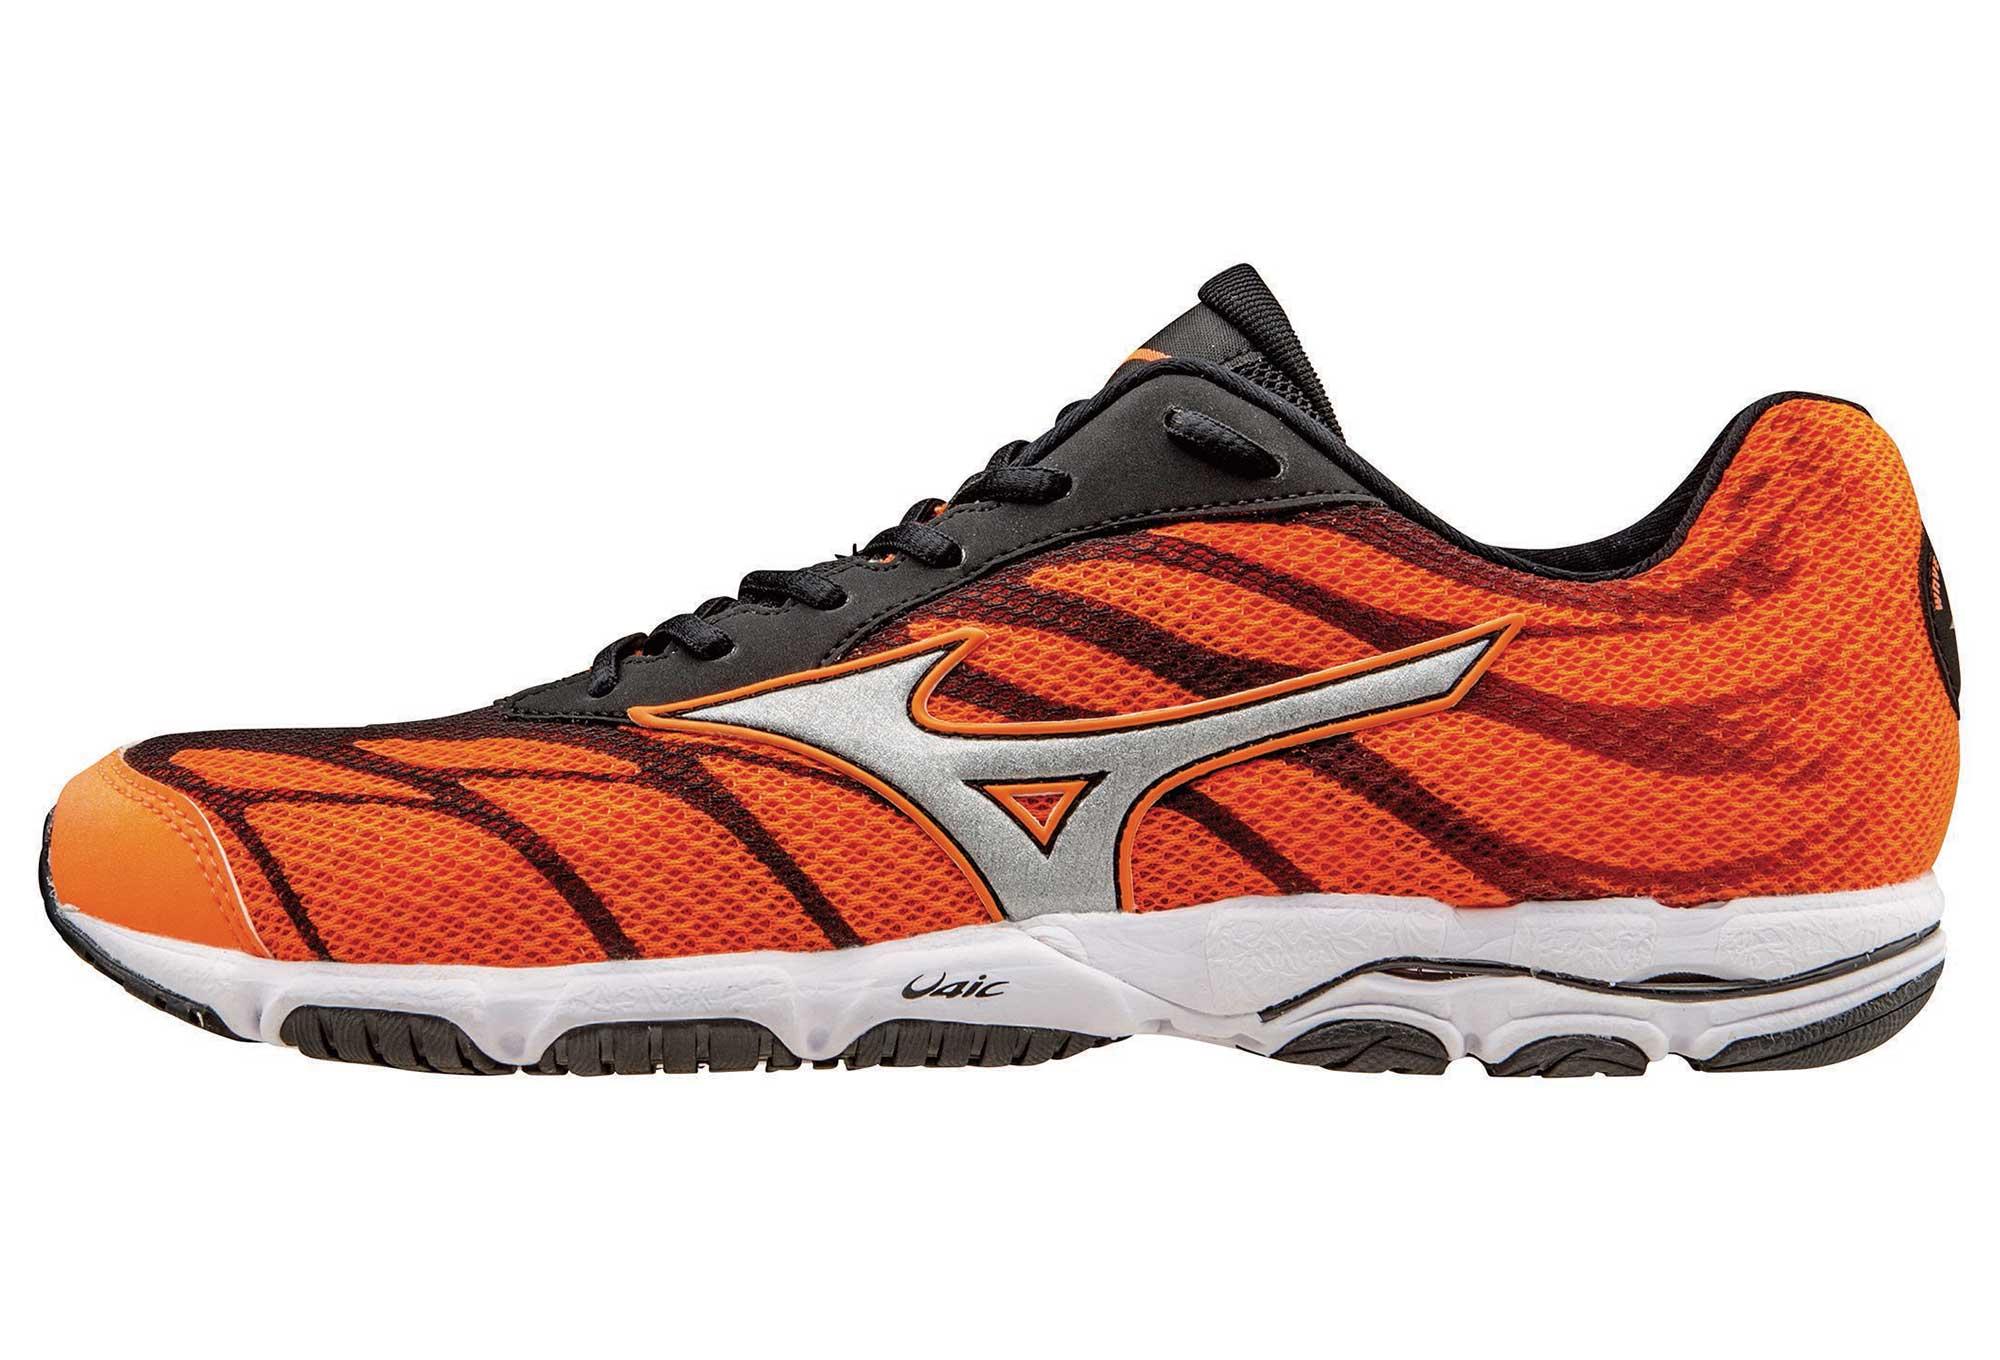 best sneakers 99db3 7a89f MIZUNO Shoes WAVE HITOGAMI 3 Orange Black Men